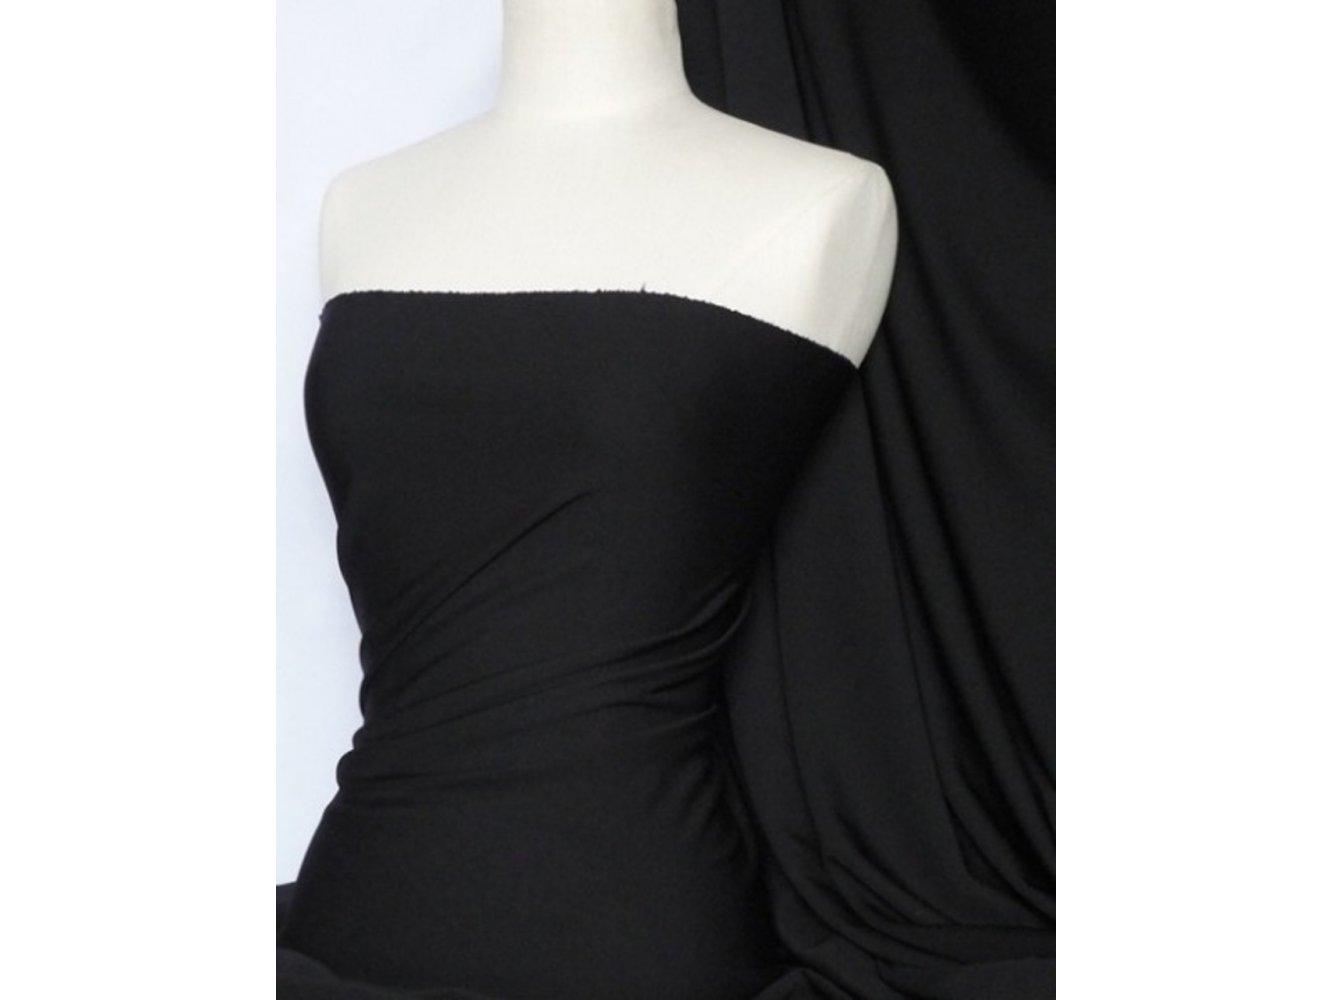 Scuba Stretch Poly Lycra Fabric- Teal Blue Q792 TLBL